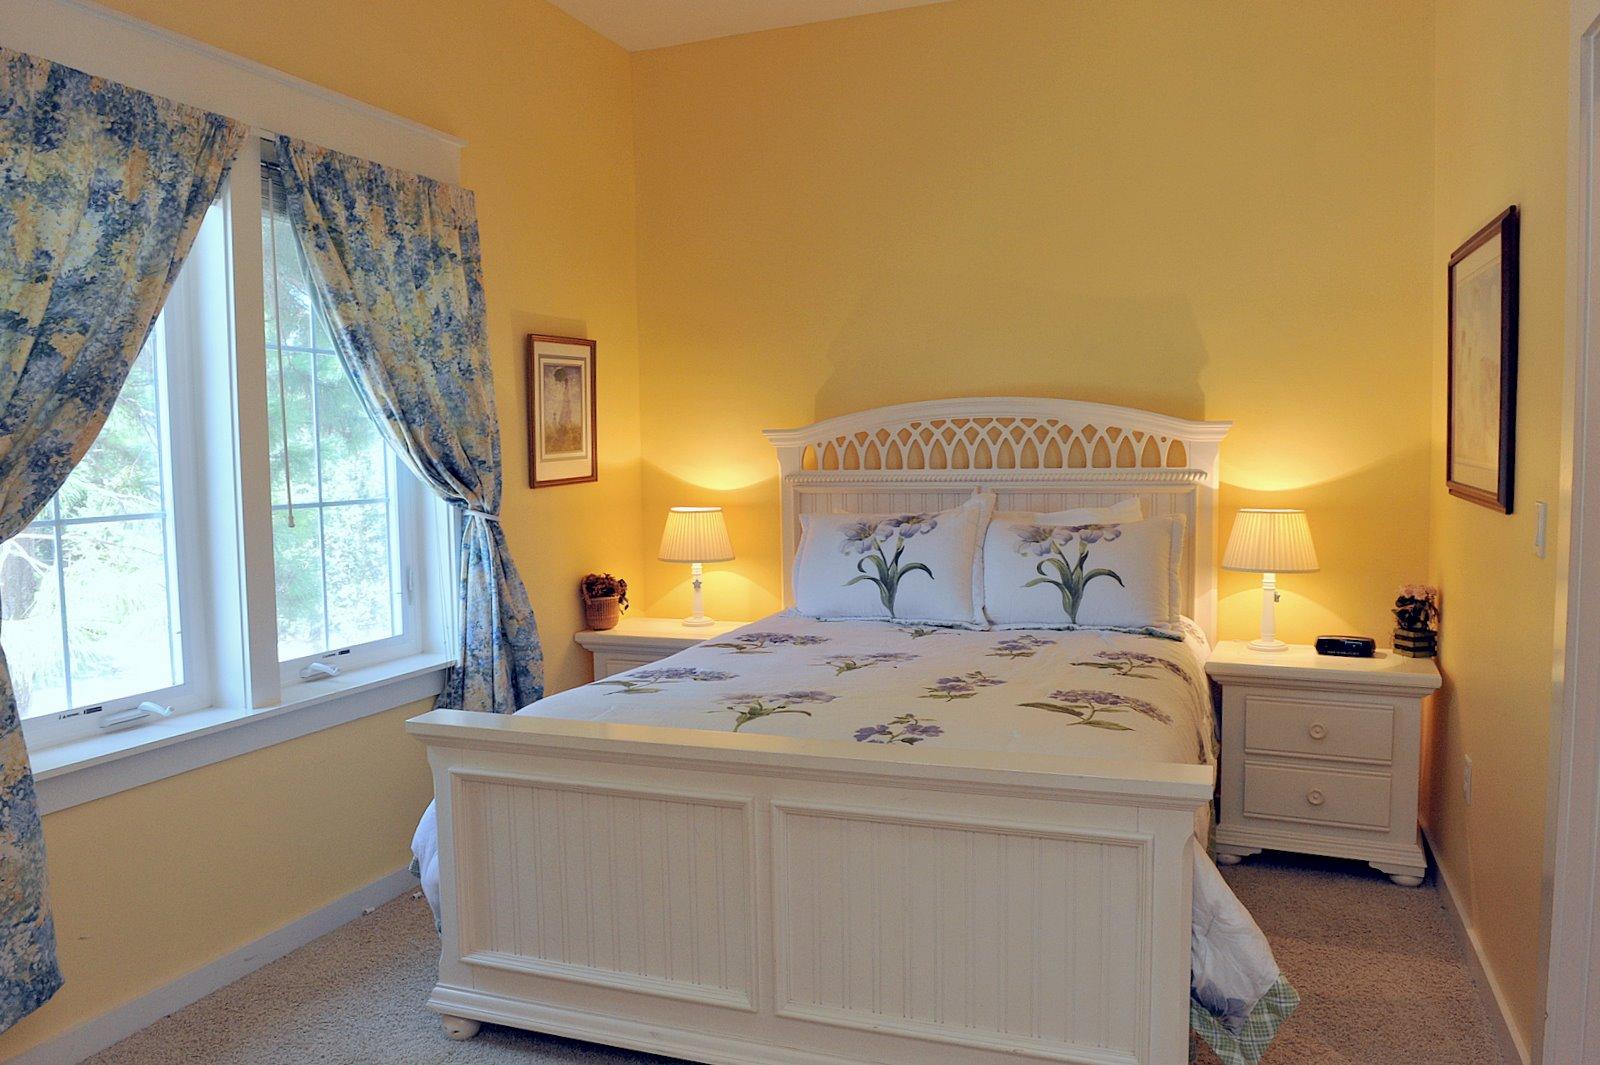 1280 Laurel Grove Condo rental in Sandestin Rentals ~ Cottages and Villas  in Destin Florida - #10